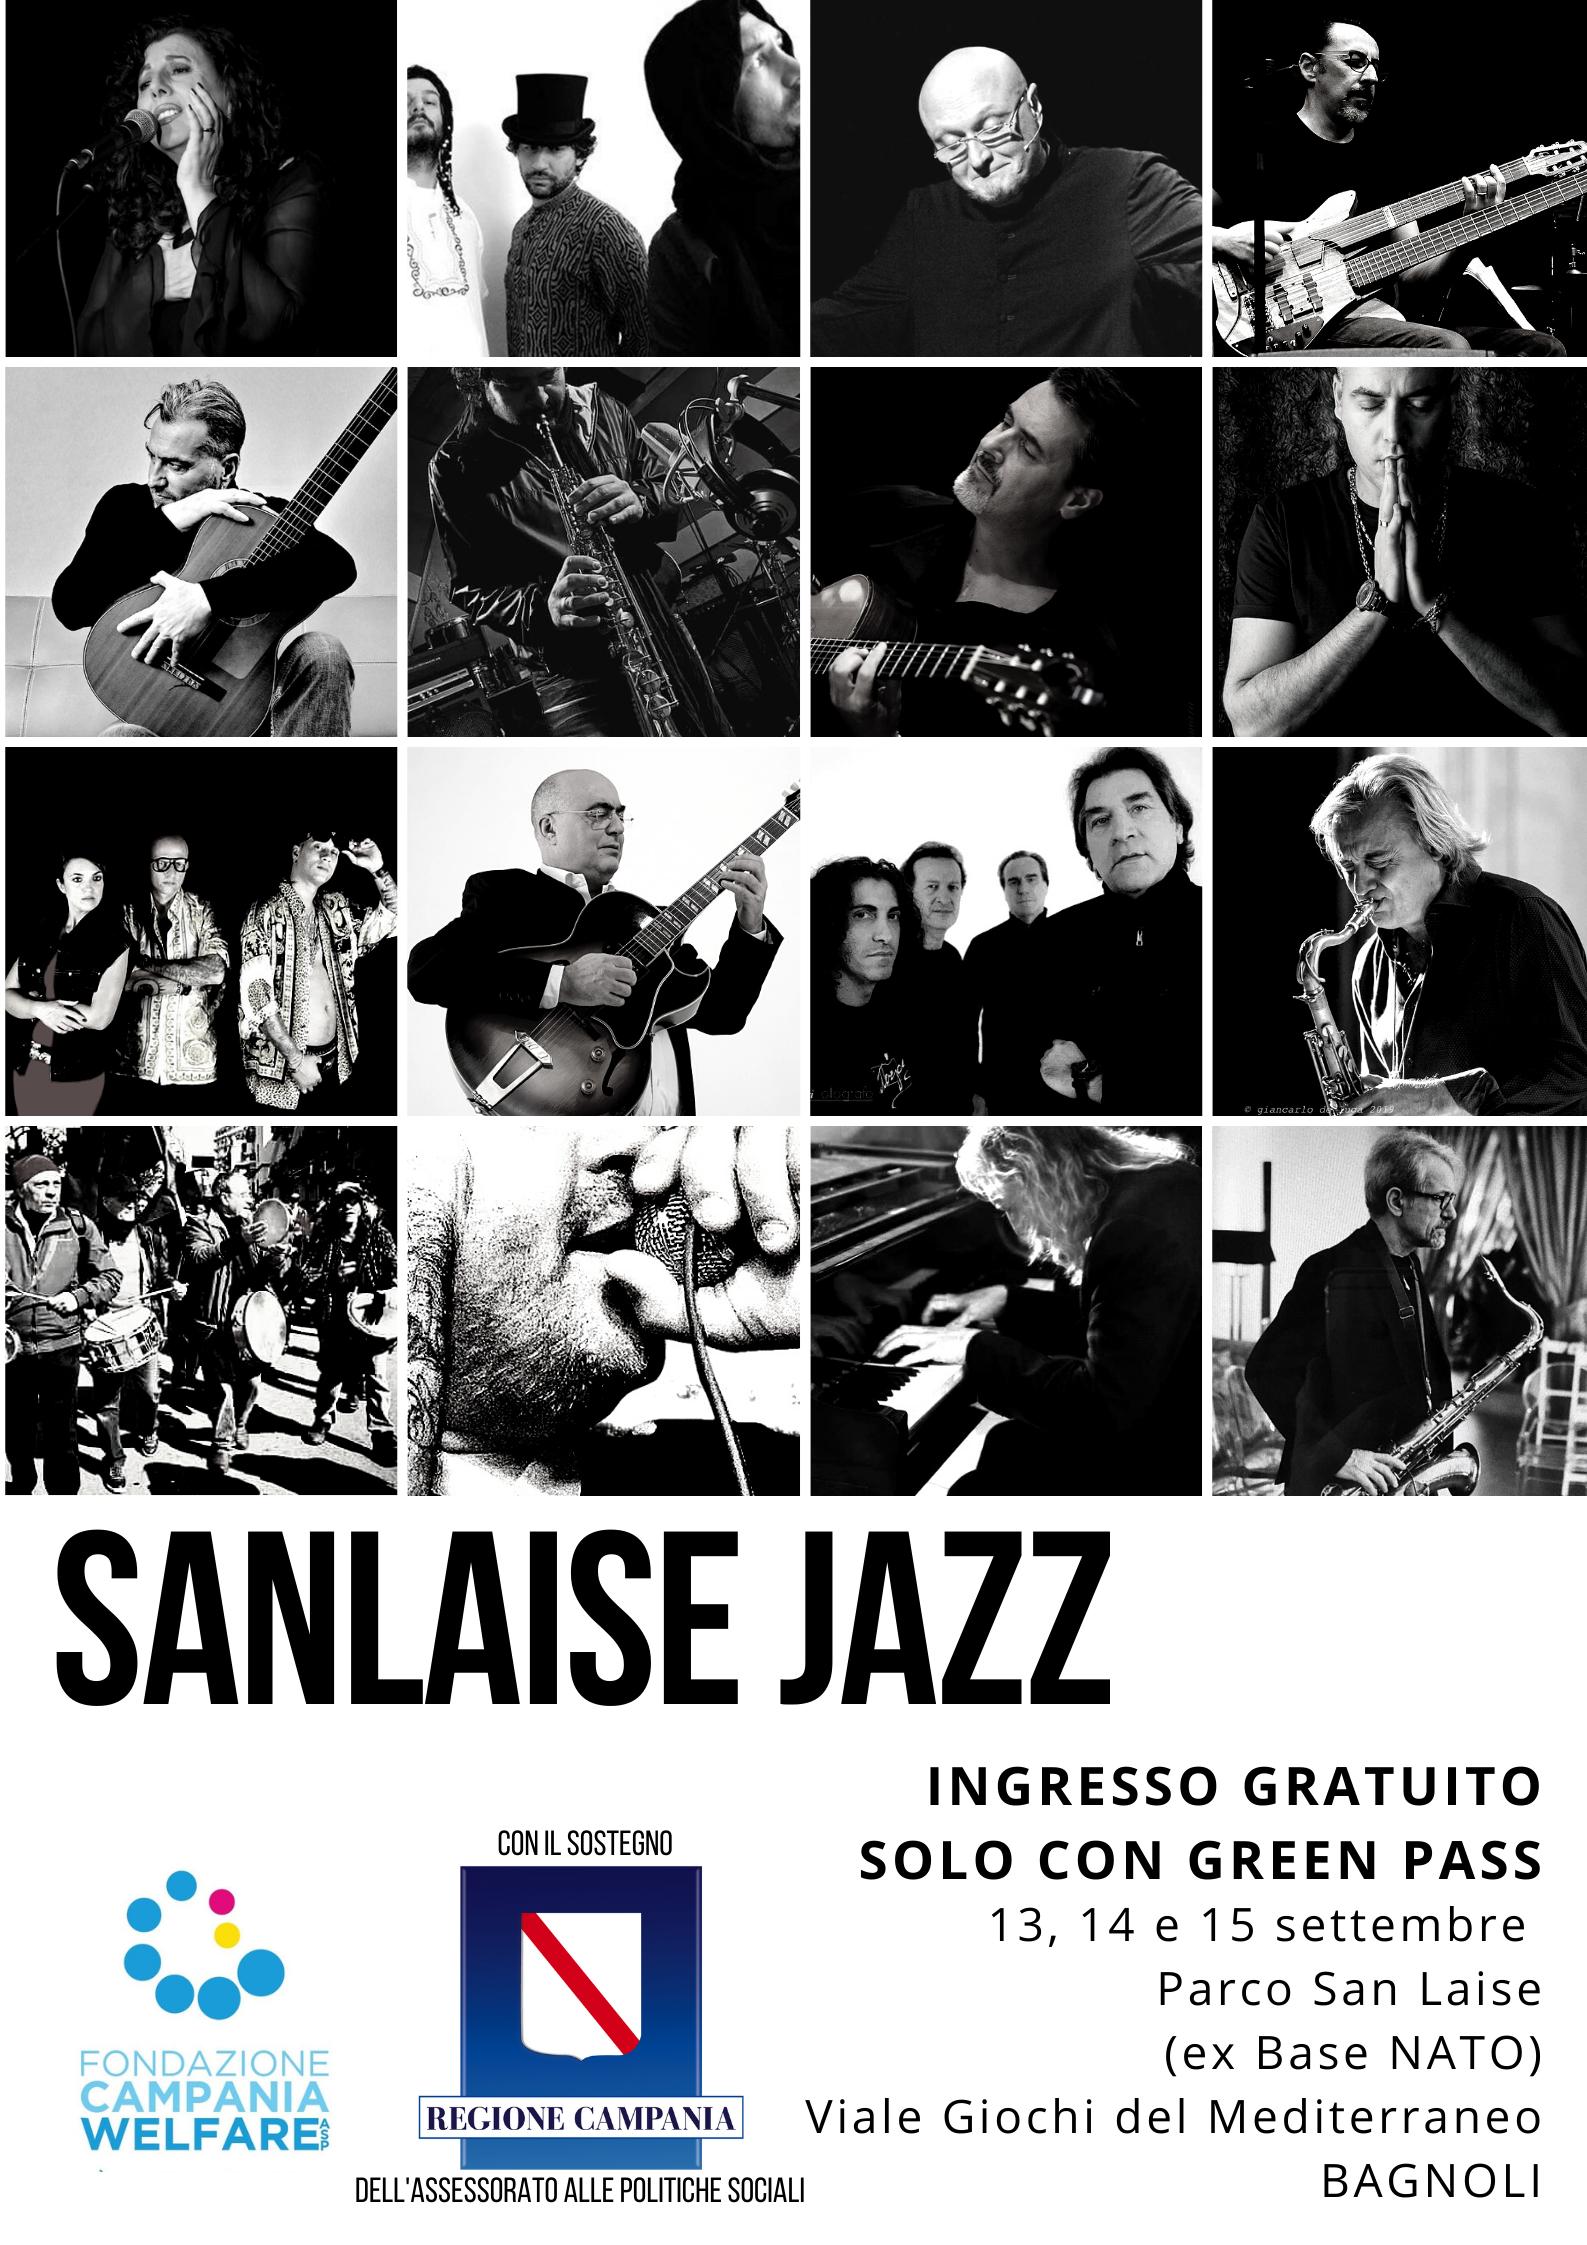 sanlaise jazz 2 BAGNOLI, SANLAISE JAZZ 2021: IL FESTIVAL CHE PRODUCE!